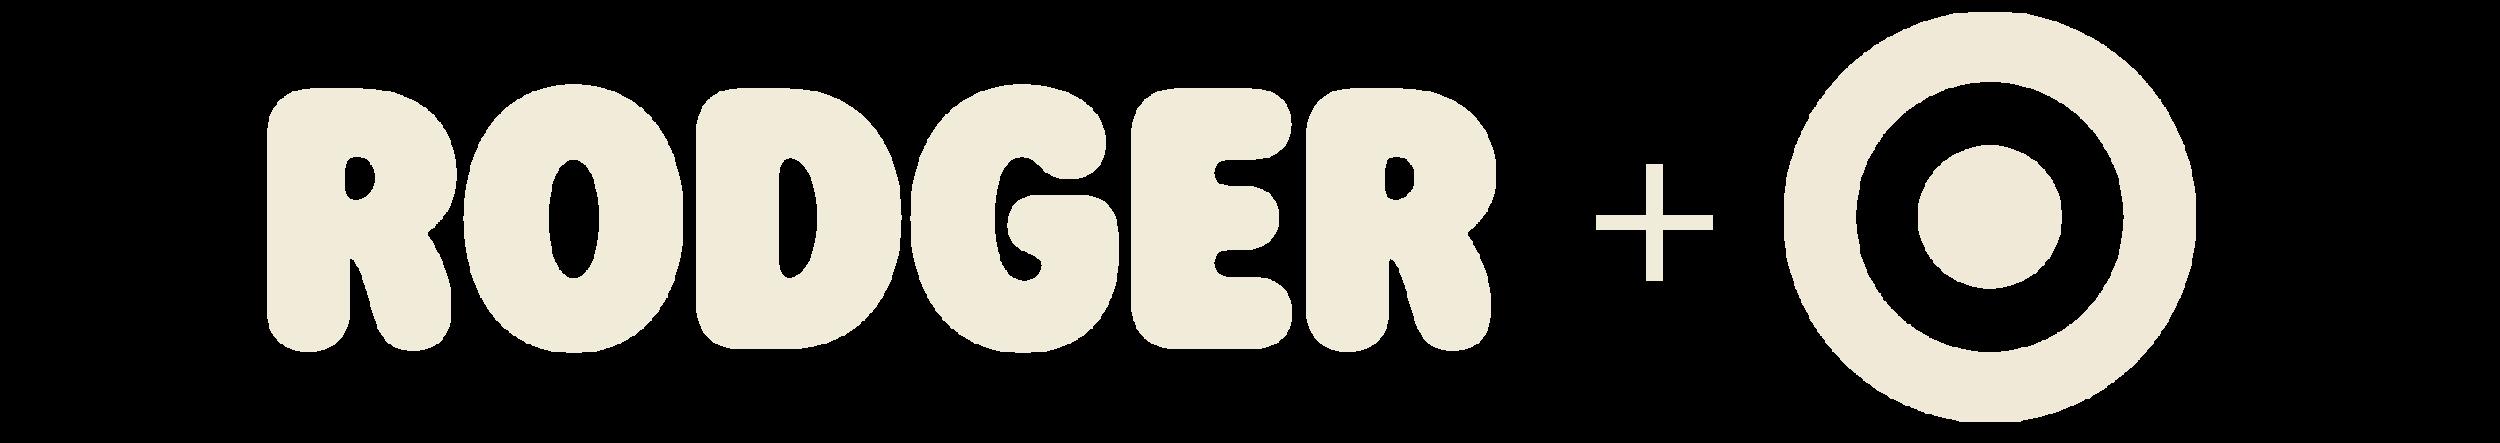 rodger_plus_target.png